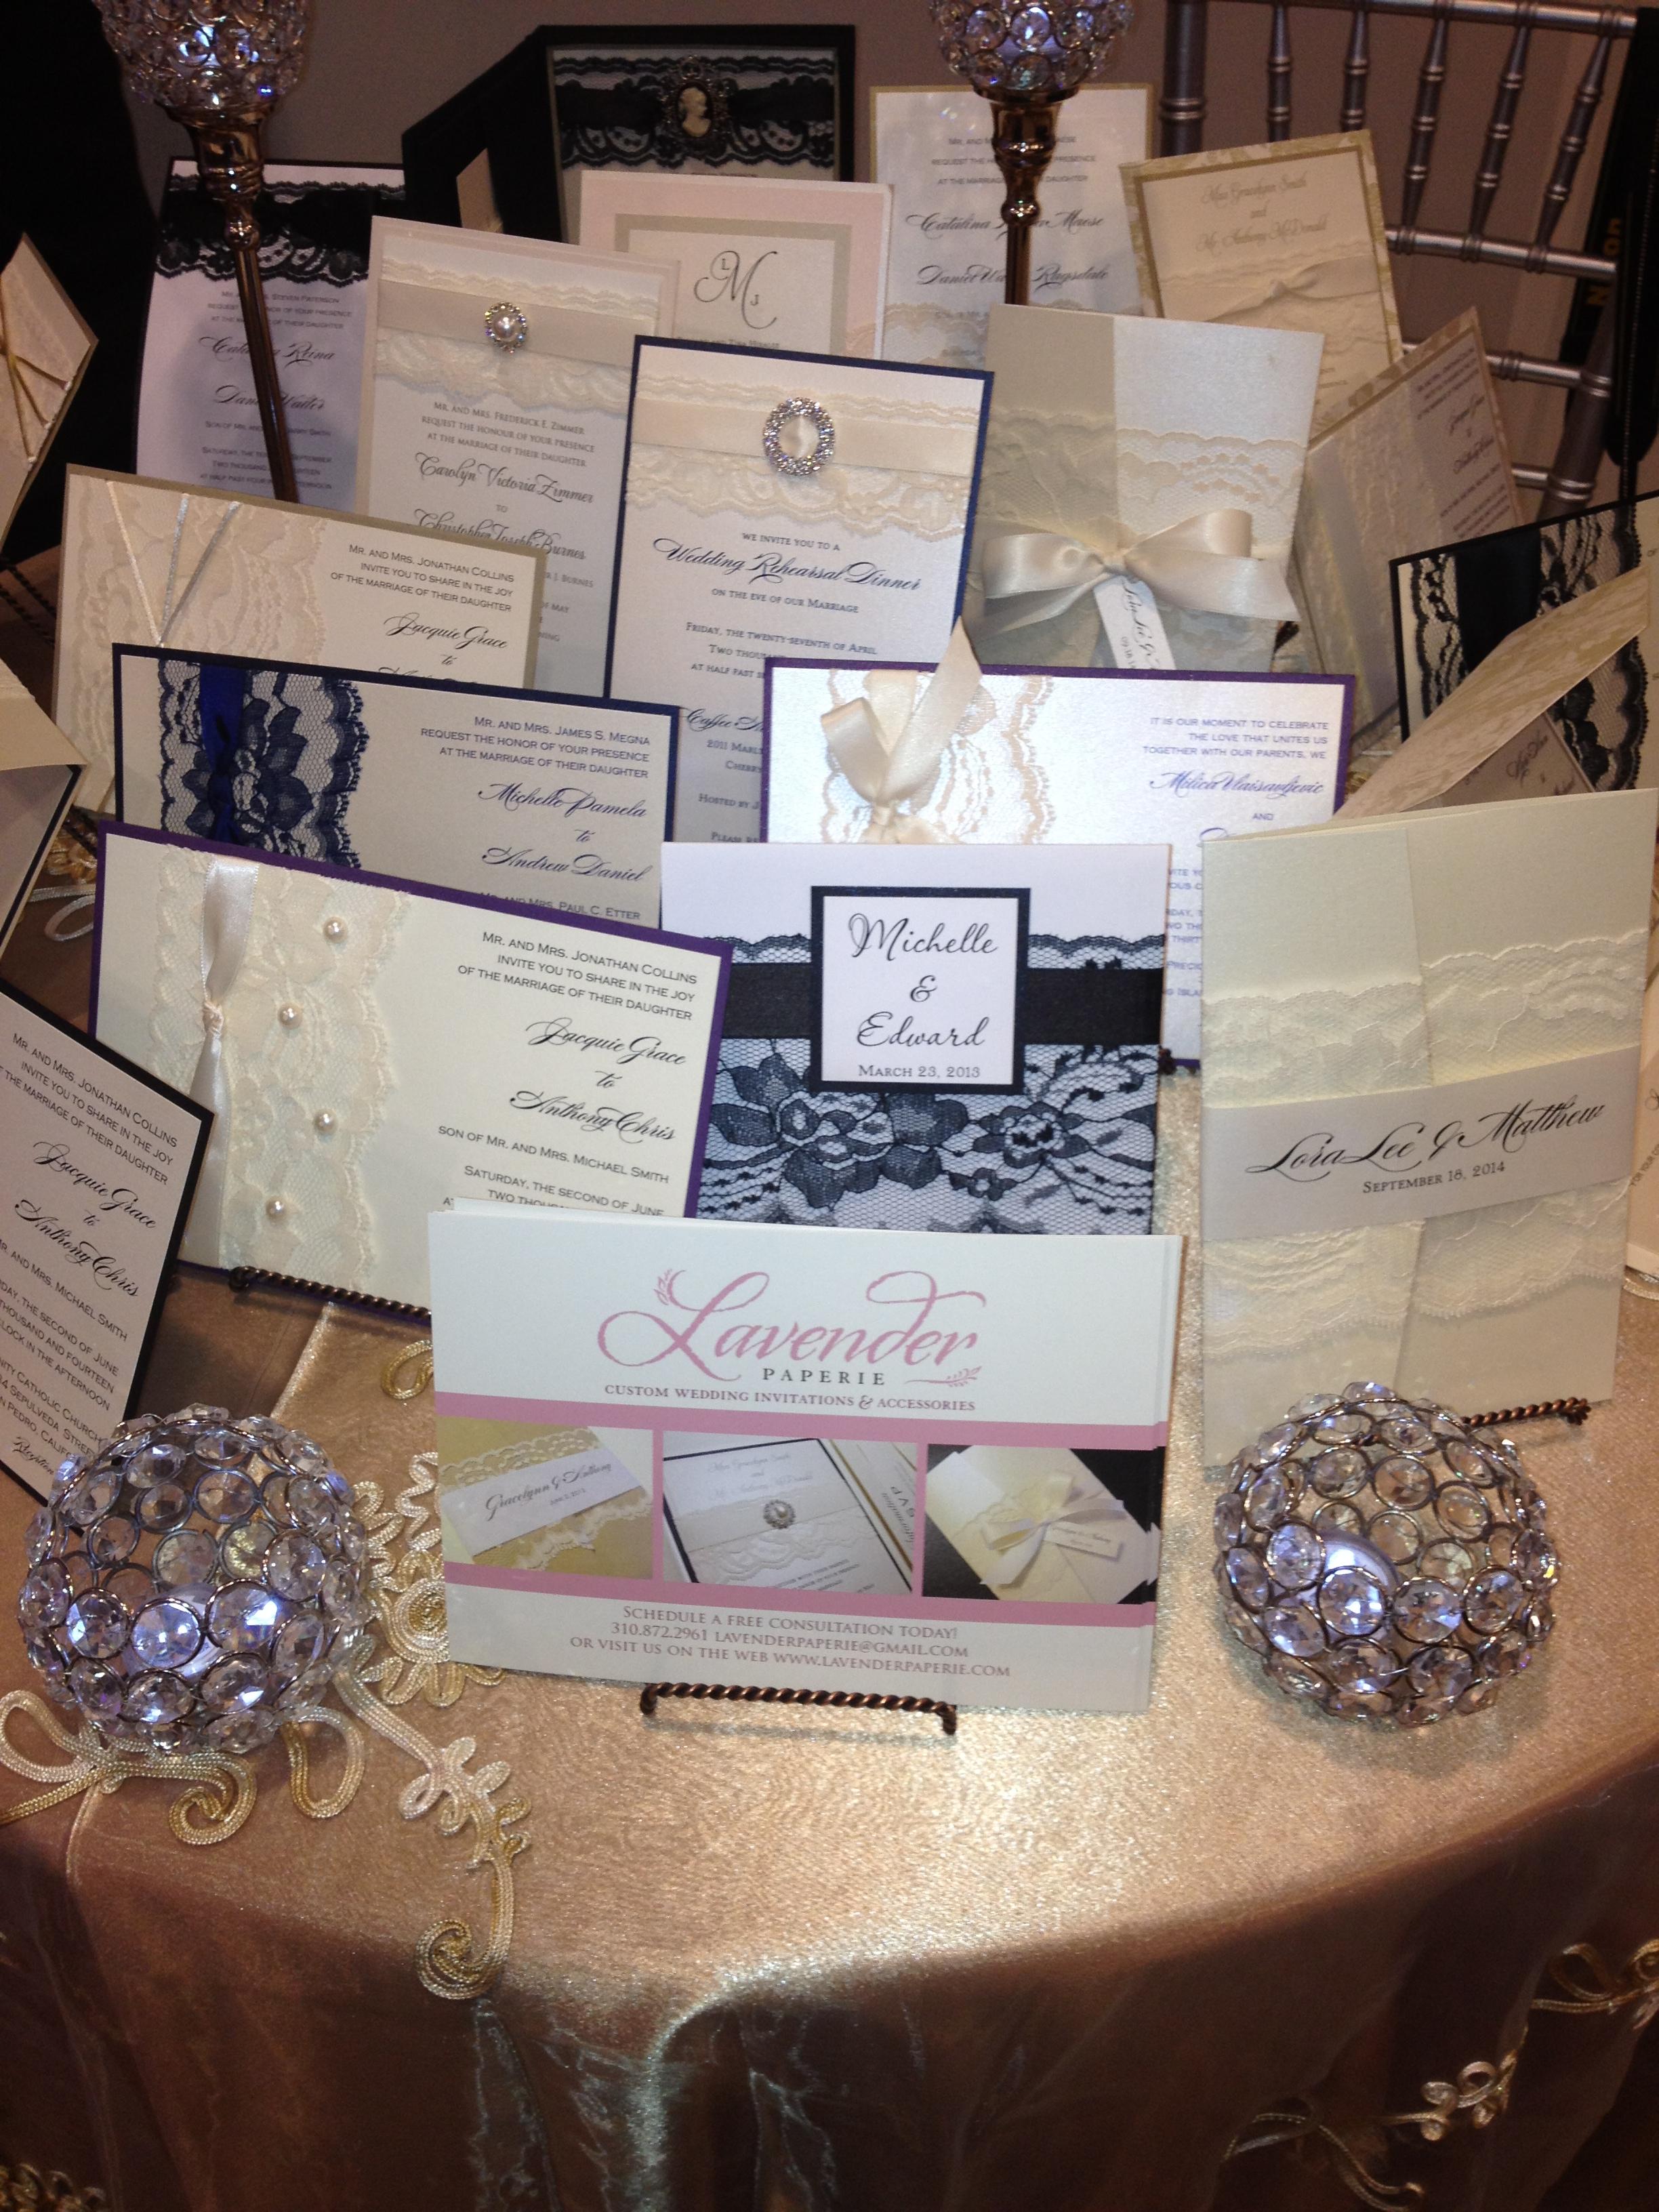 wedding ideas bling wedding invitations Elegant wedding invitations with lace bling and pearls Lavender Paperie